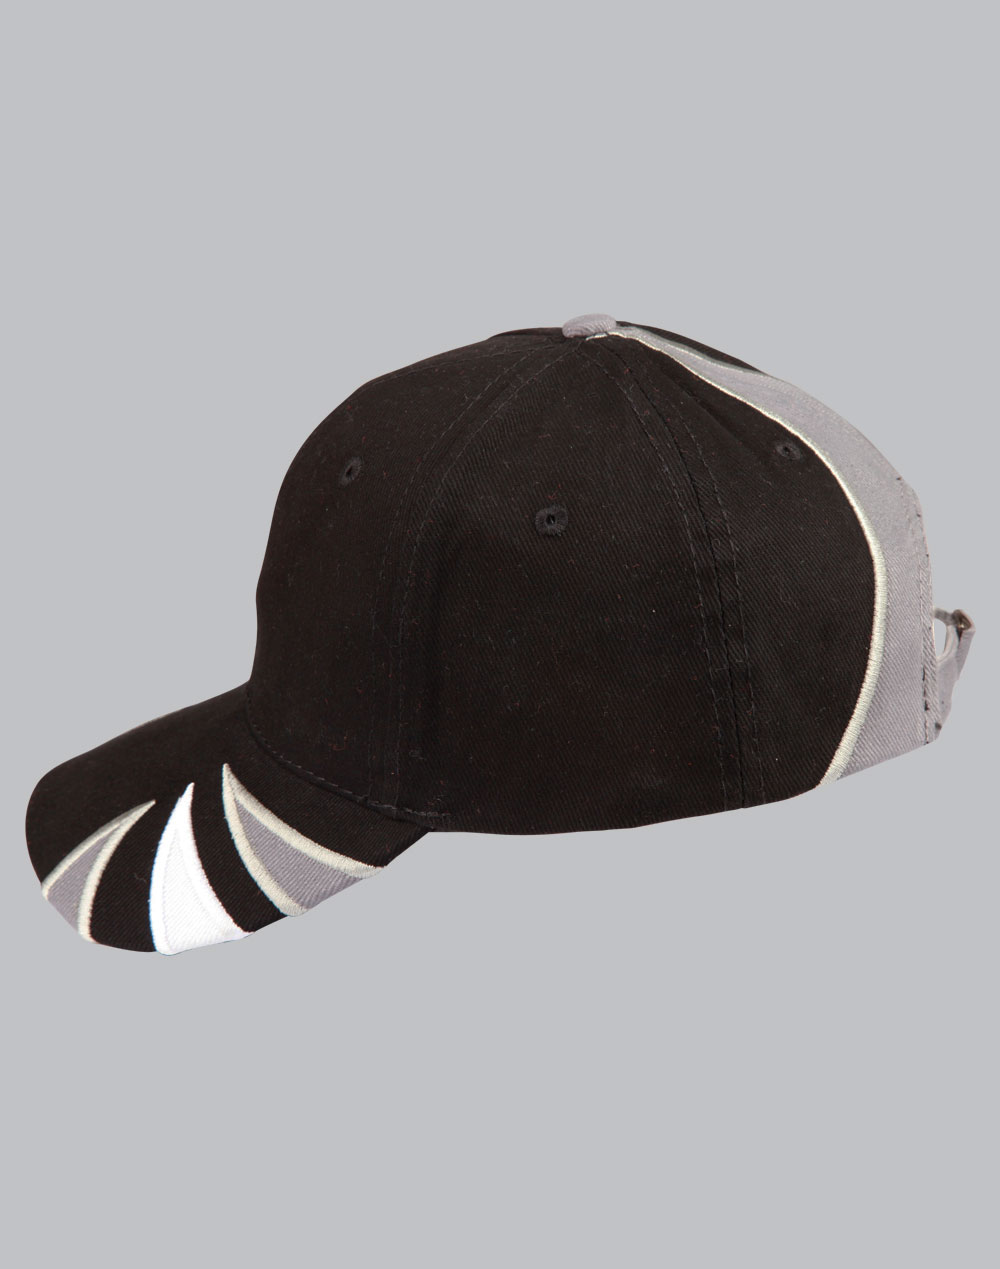 https://s3-ap-southeast-1.amazonaws.com/ws-imgs/CAPS/CH80_Black.White.Grey_Side.jpg